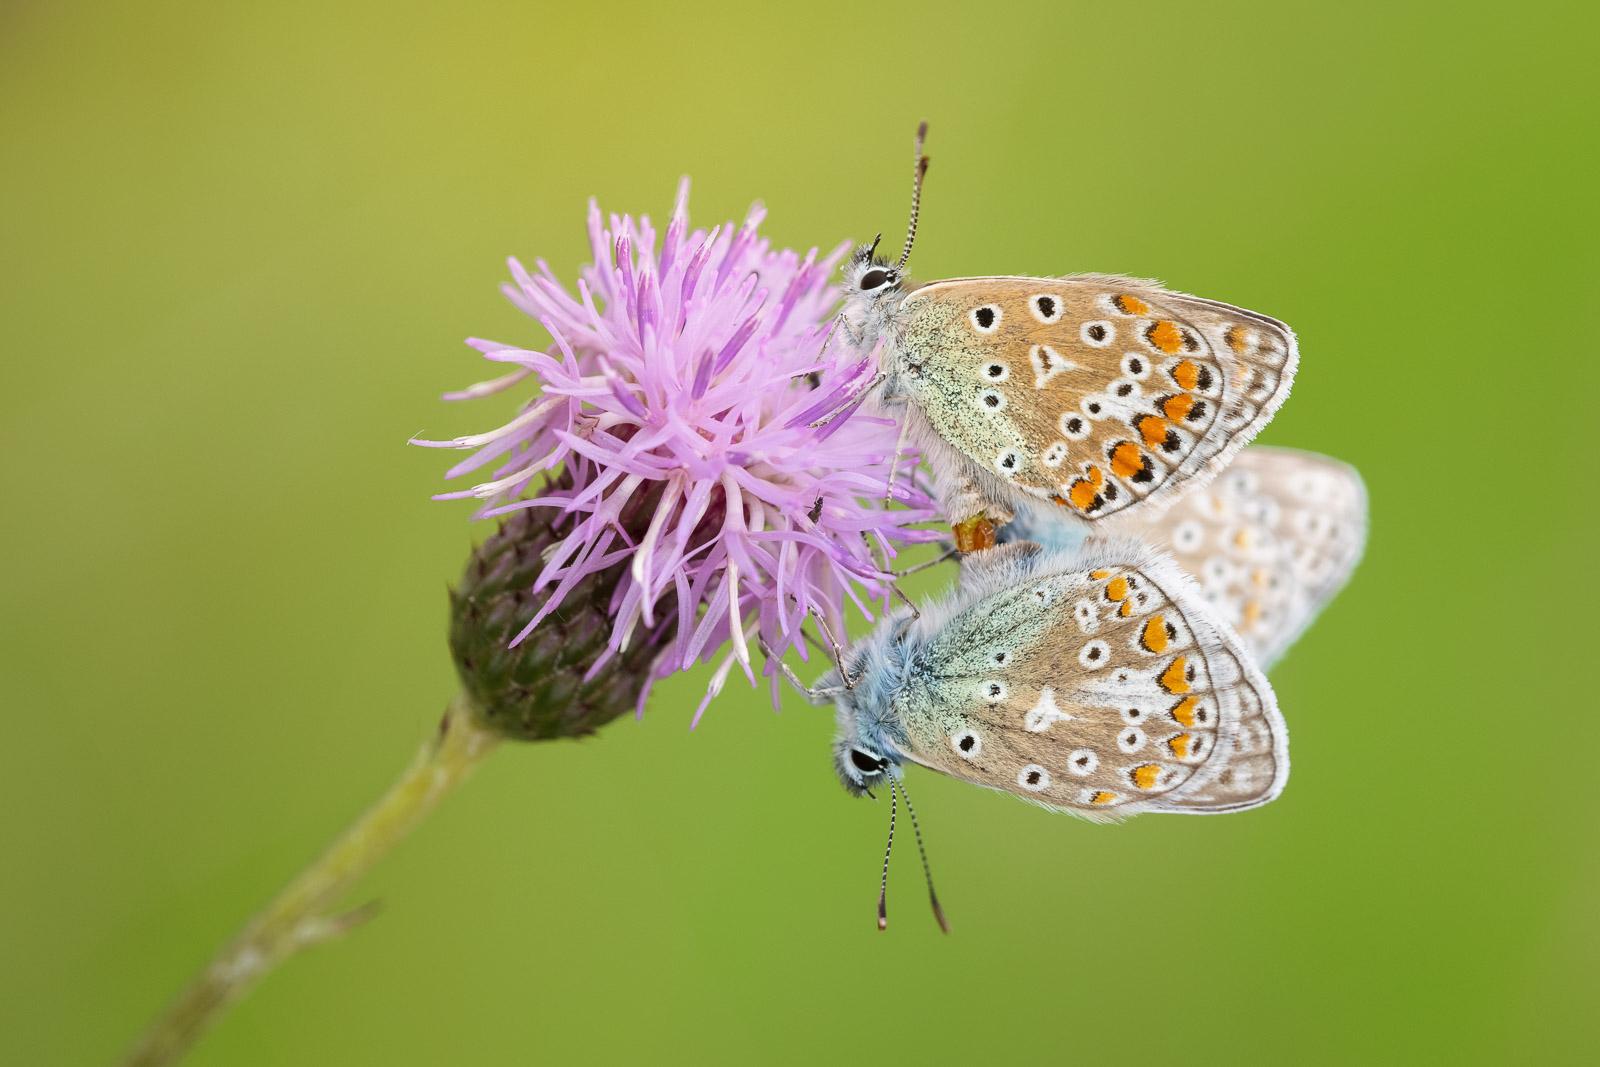 Common Blue (Polyommatus icarus) - Middledown, Mendip Hills, Somerset, UK. ID BR54217